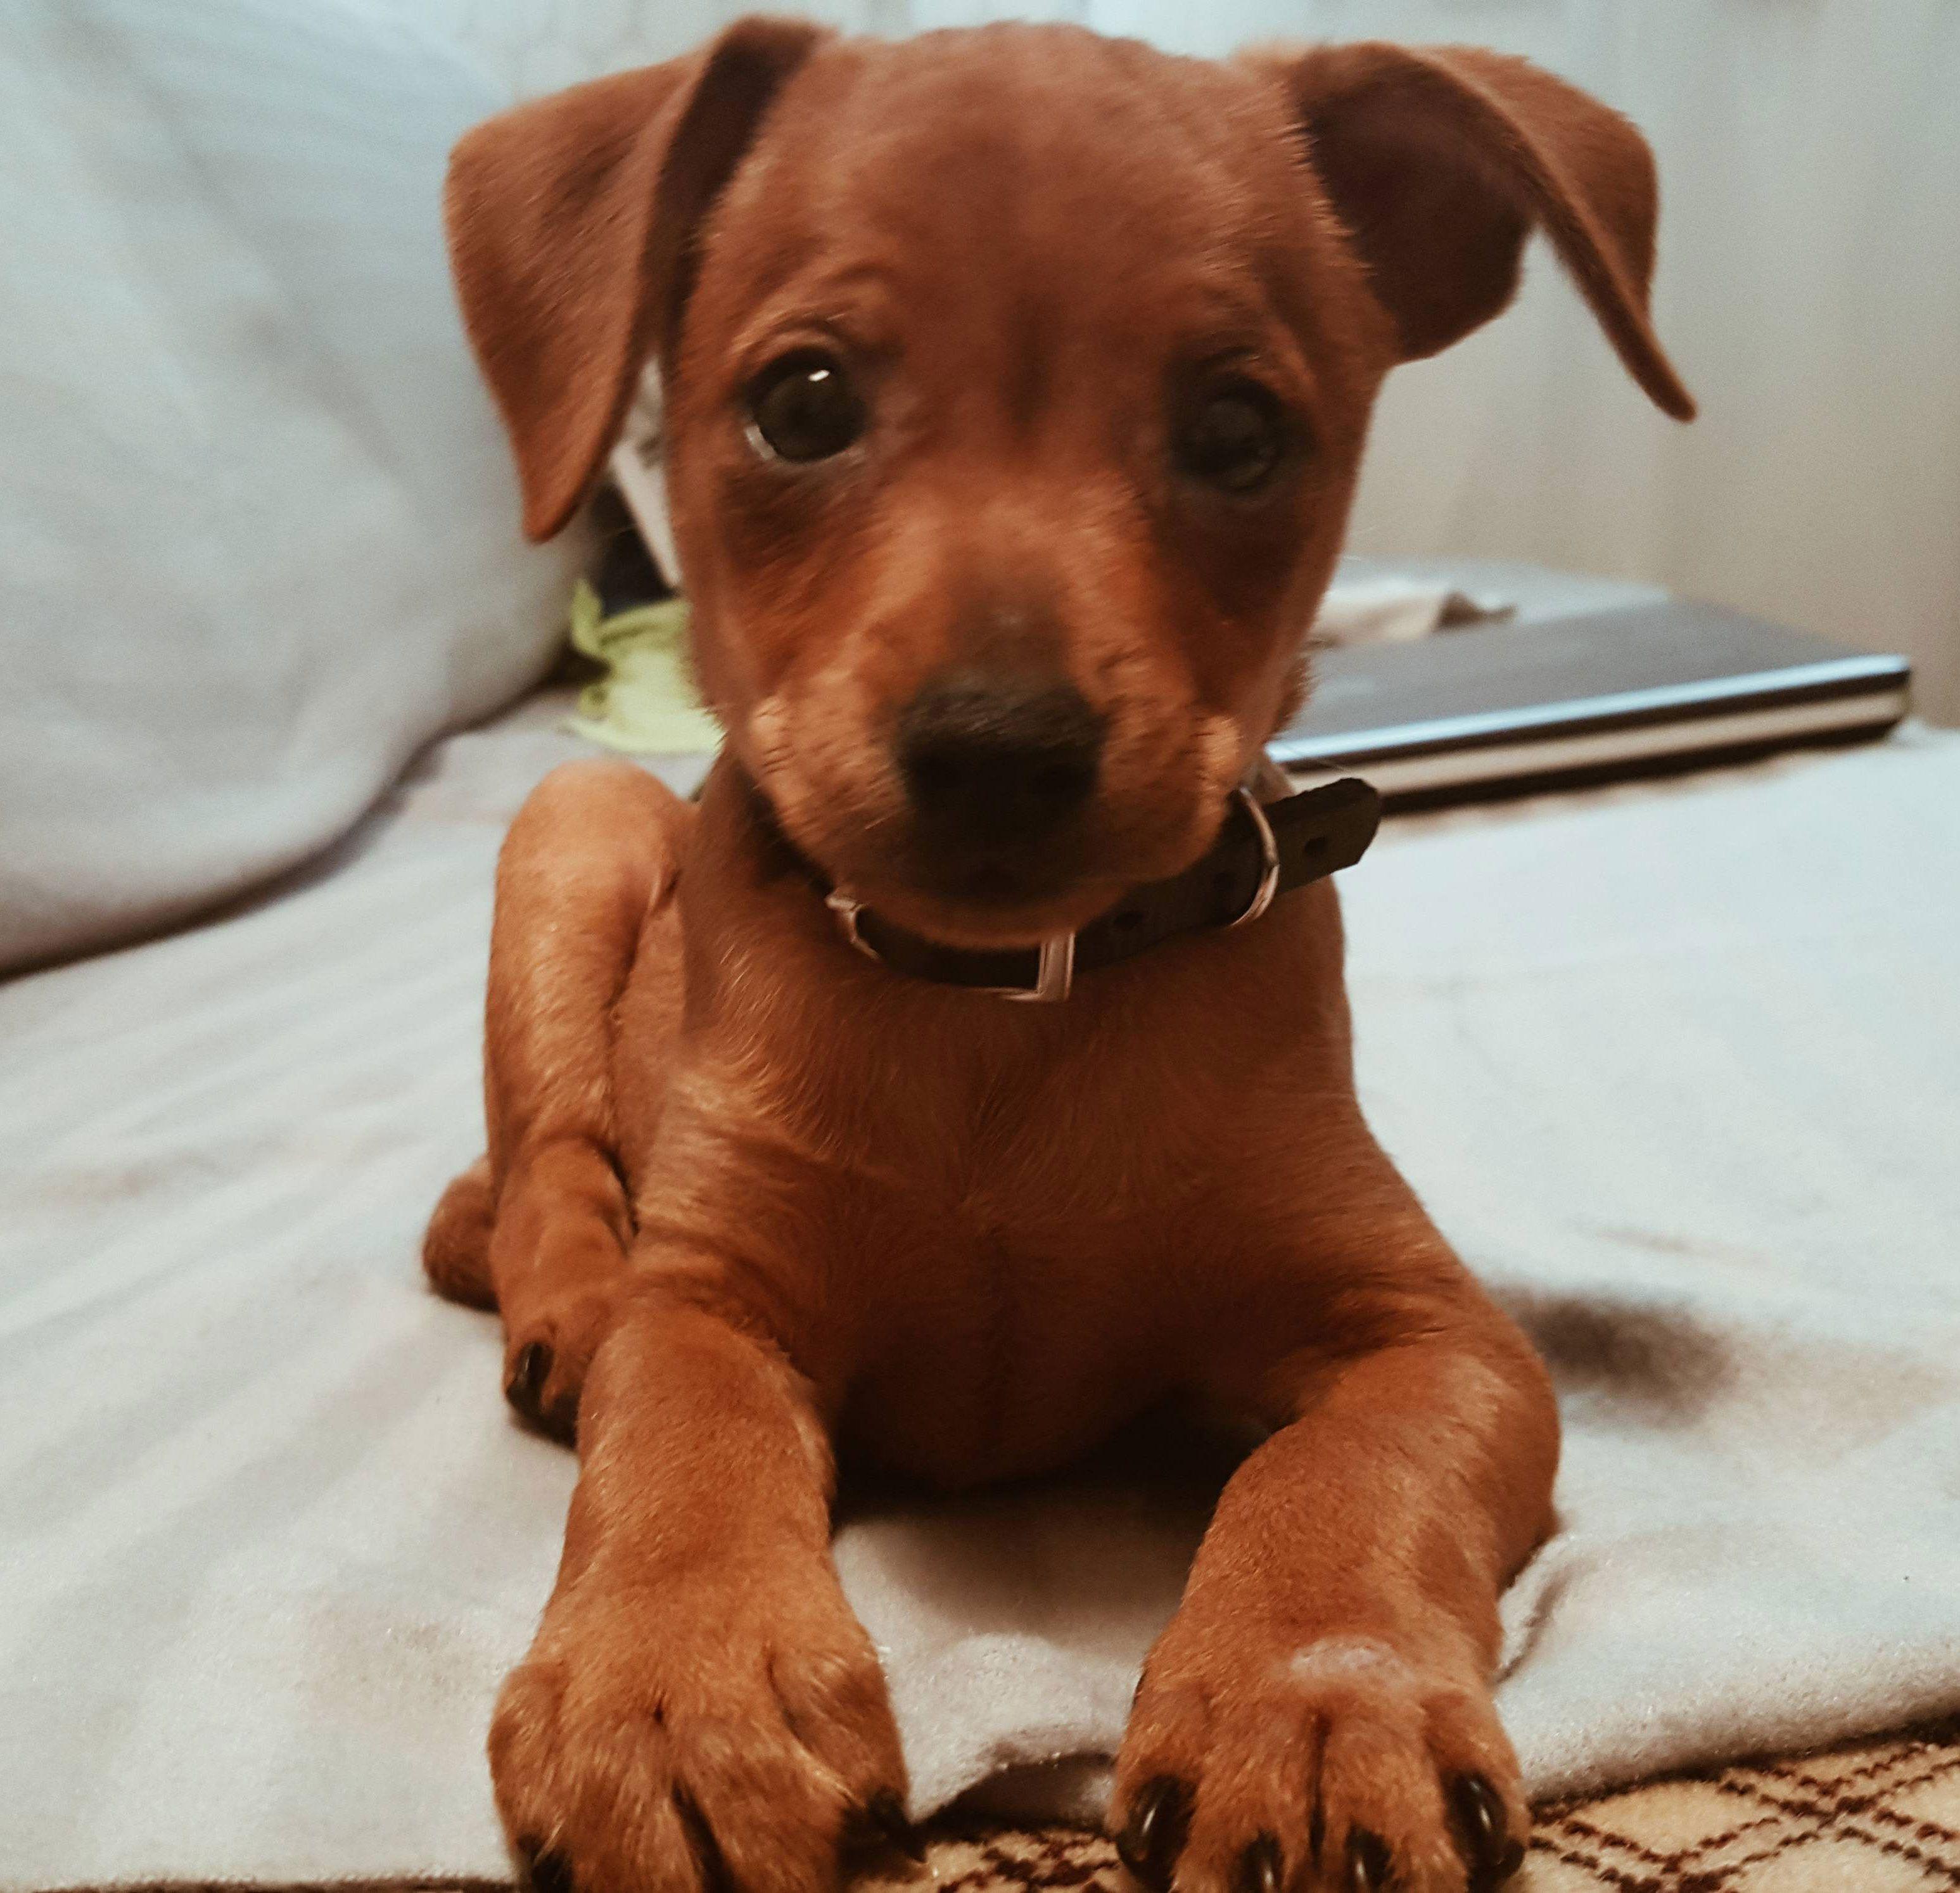 Meet Onyx, Adorable cute Rhodesian Ridgeback puppy